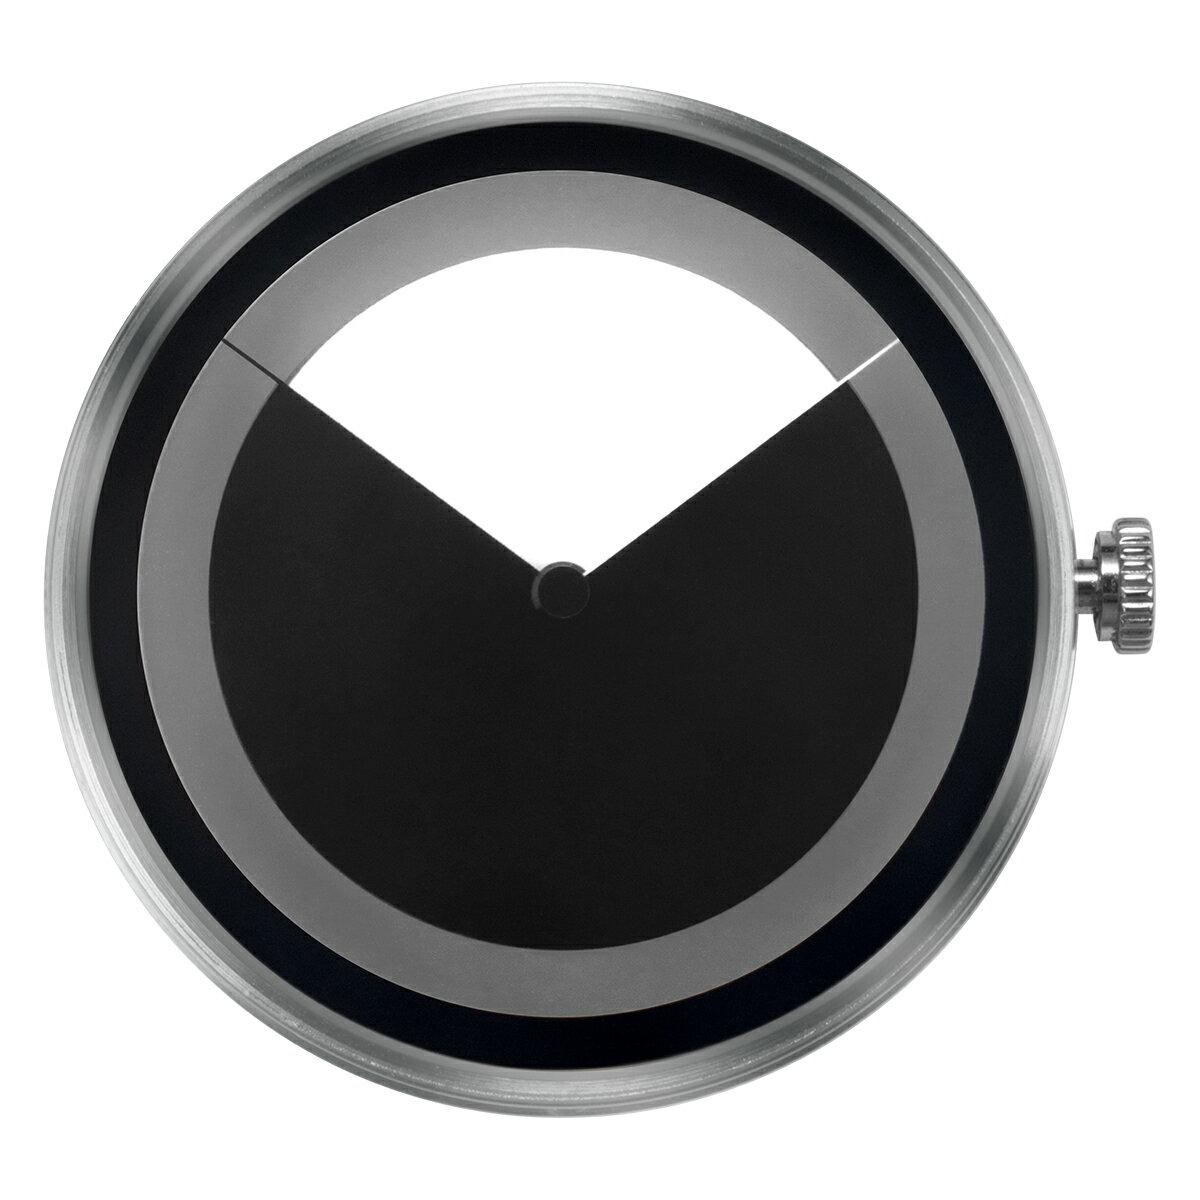 ZEROO 交換用クロックボディ ZEROO DEEPSKY SWEEPING ゼロ 電池式クォーツ 腕時計 [M04012]